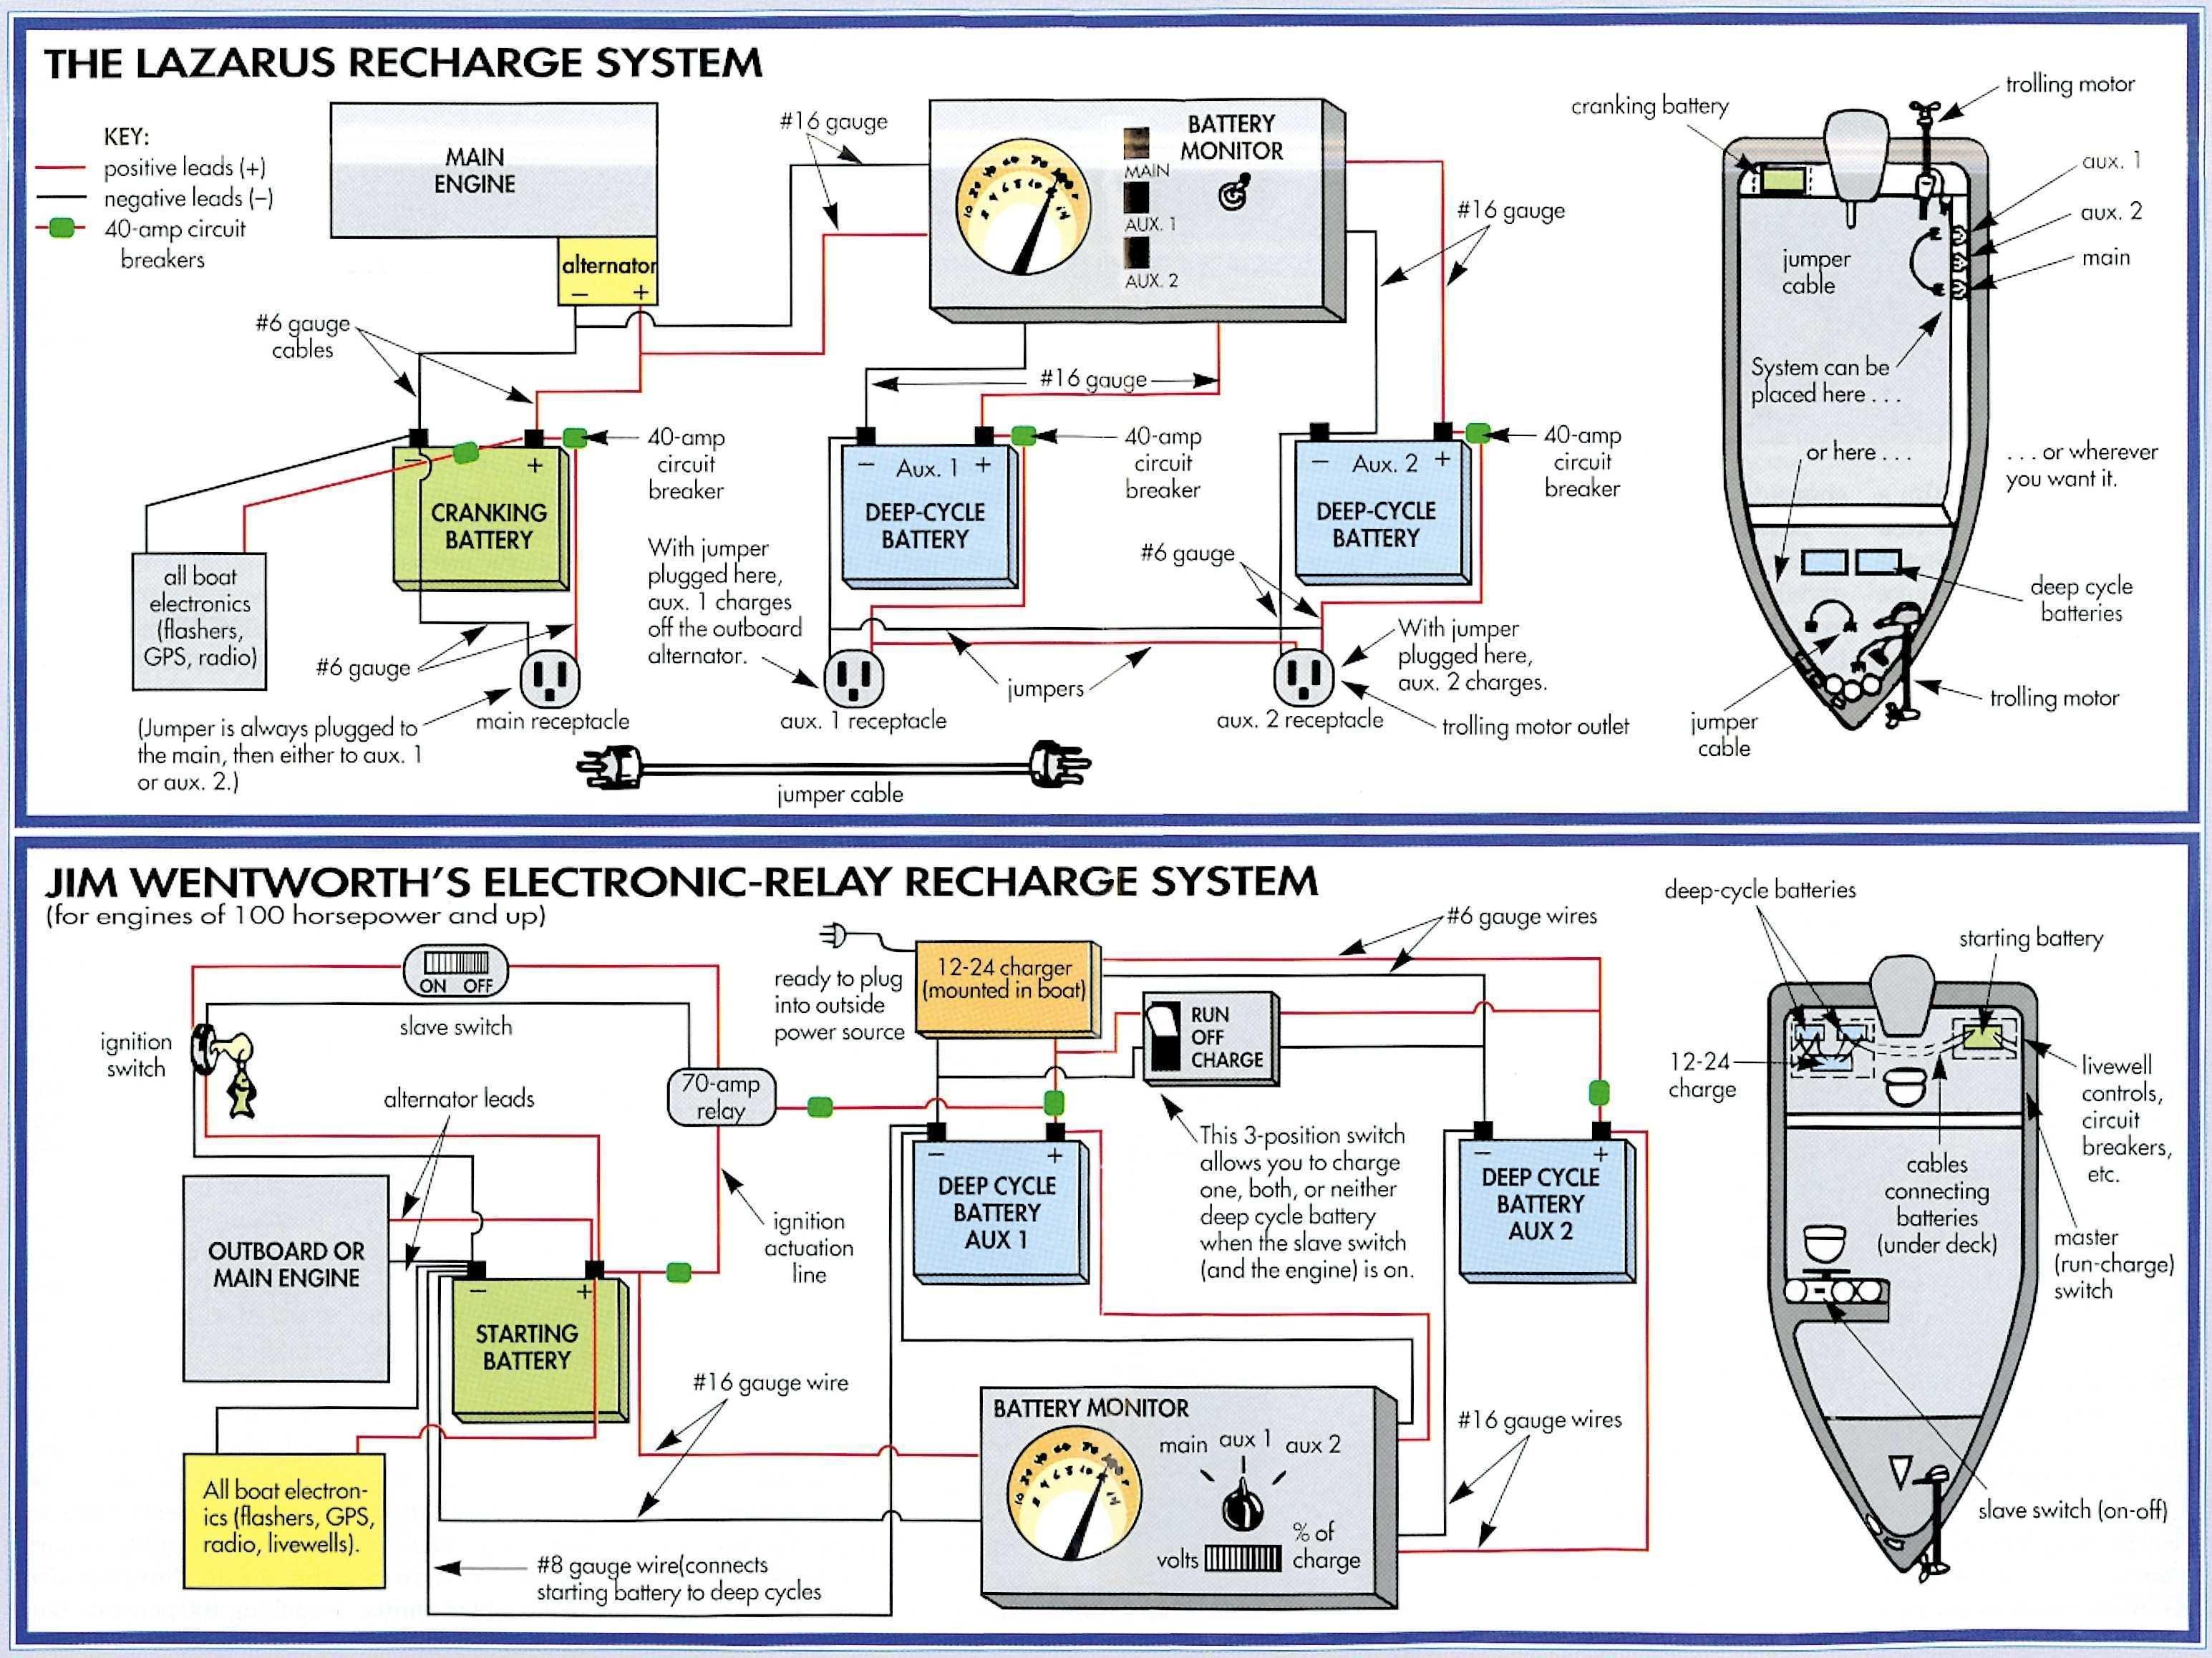 Boat Trolling Motor 24V Battery Wiring Diagram | Wiring Diagram - 12 24 Volt Trolling Motor Wiring Diagram